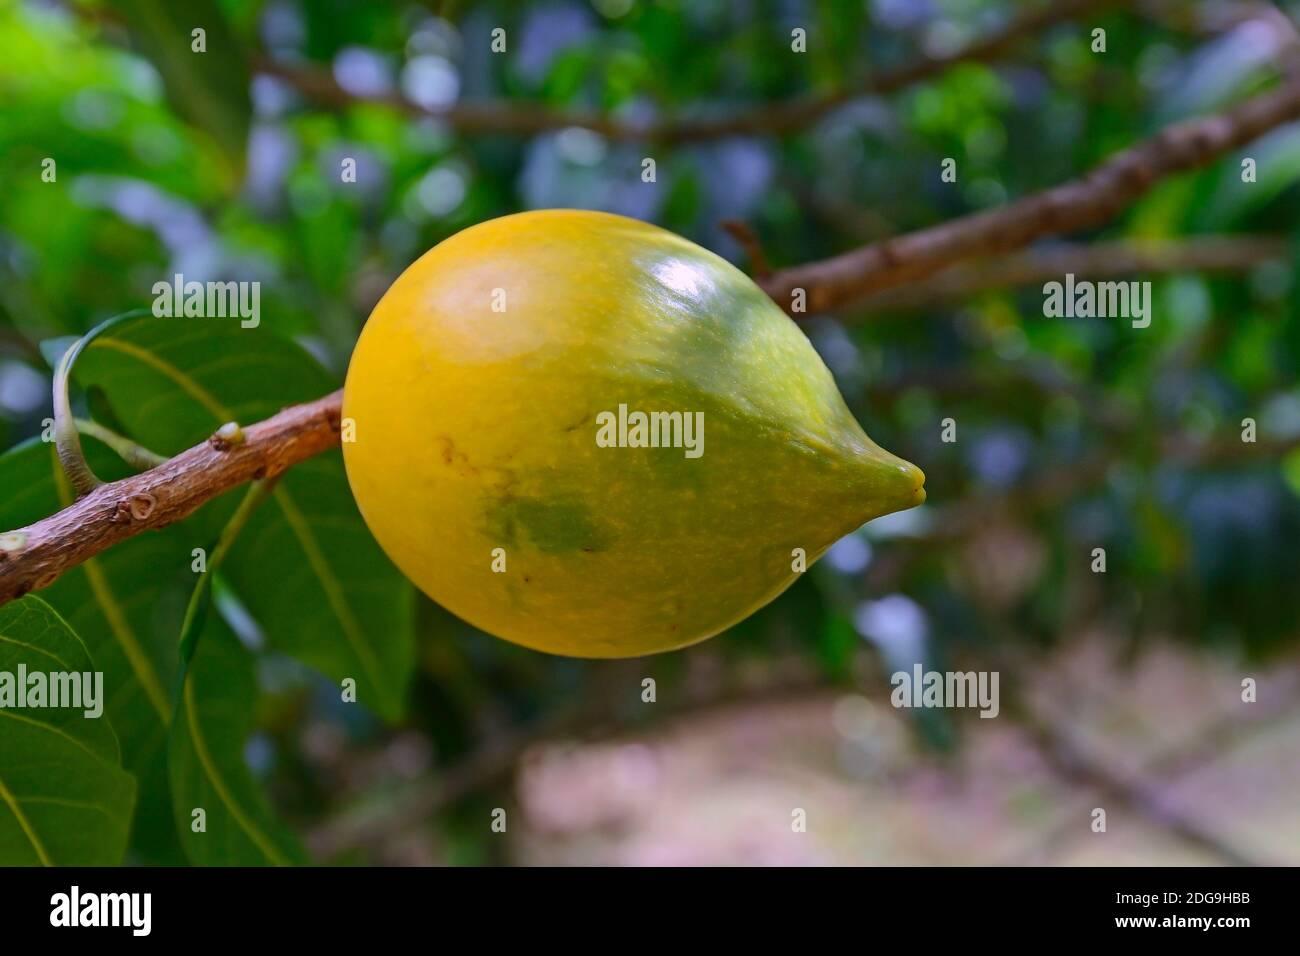 Caimito-Eierfrucht (Pouteria caimito), Rarität, Insel Mahe, Seychellen Stock Photo